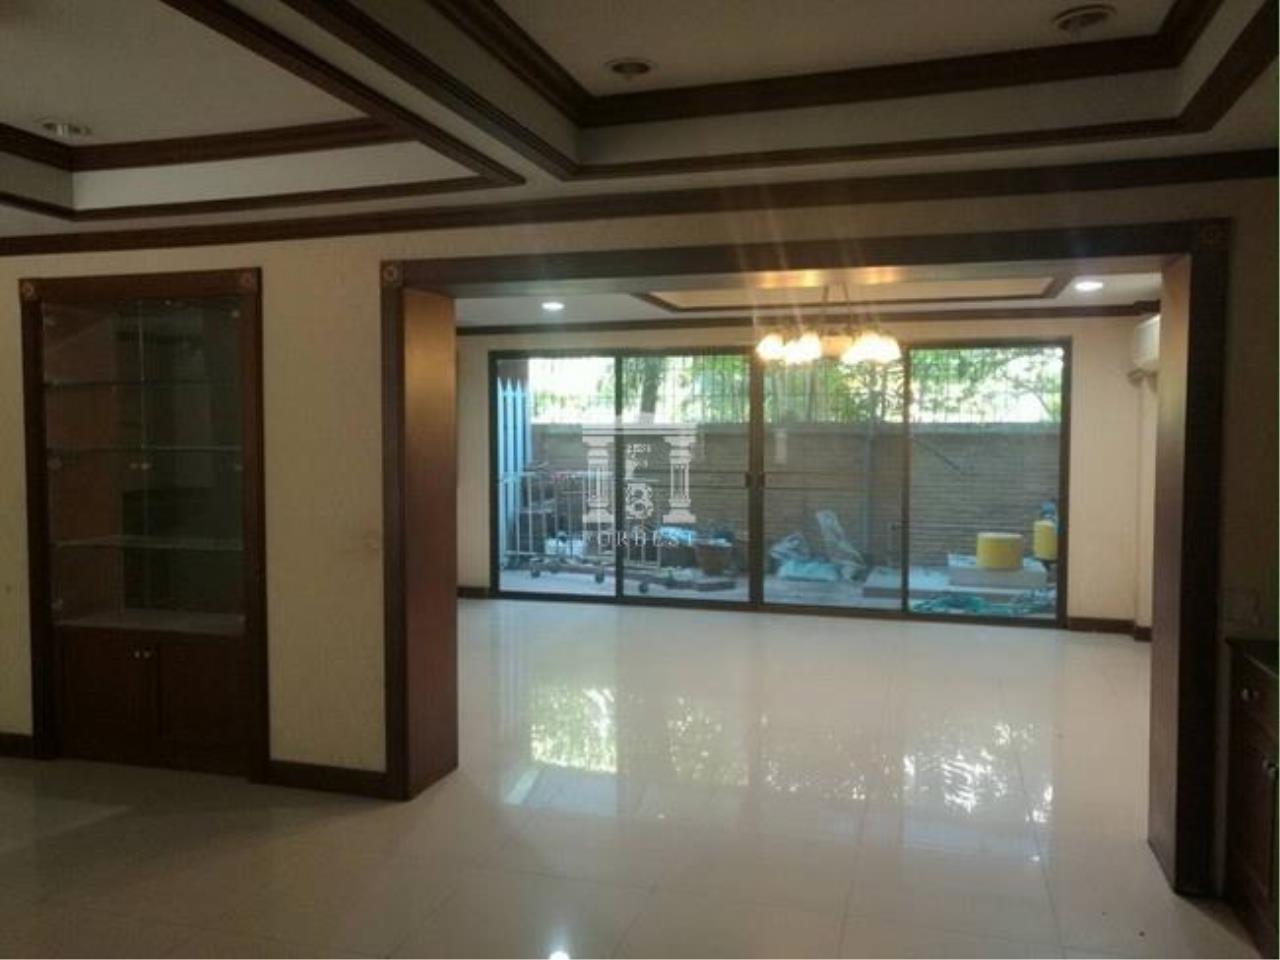 37074-Townhouse for rent, on Sukhumvit 49 rd., 60 sq.wa.